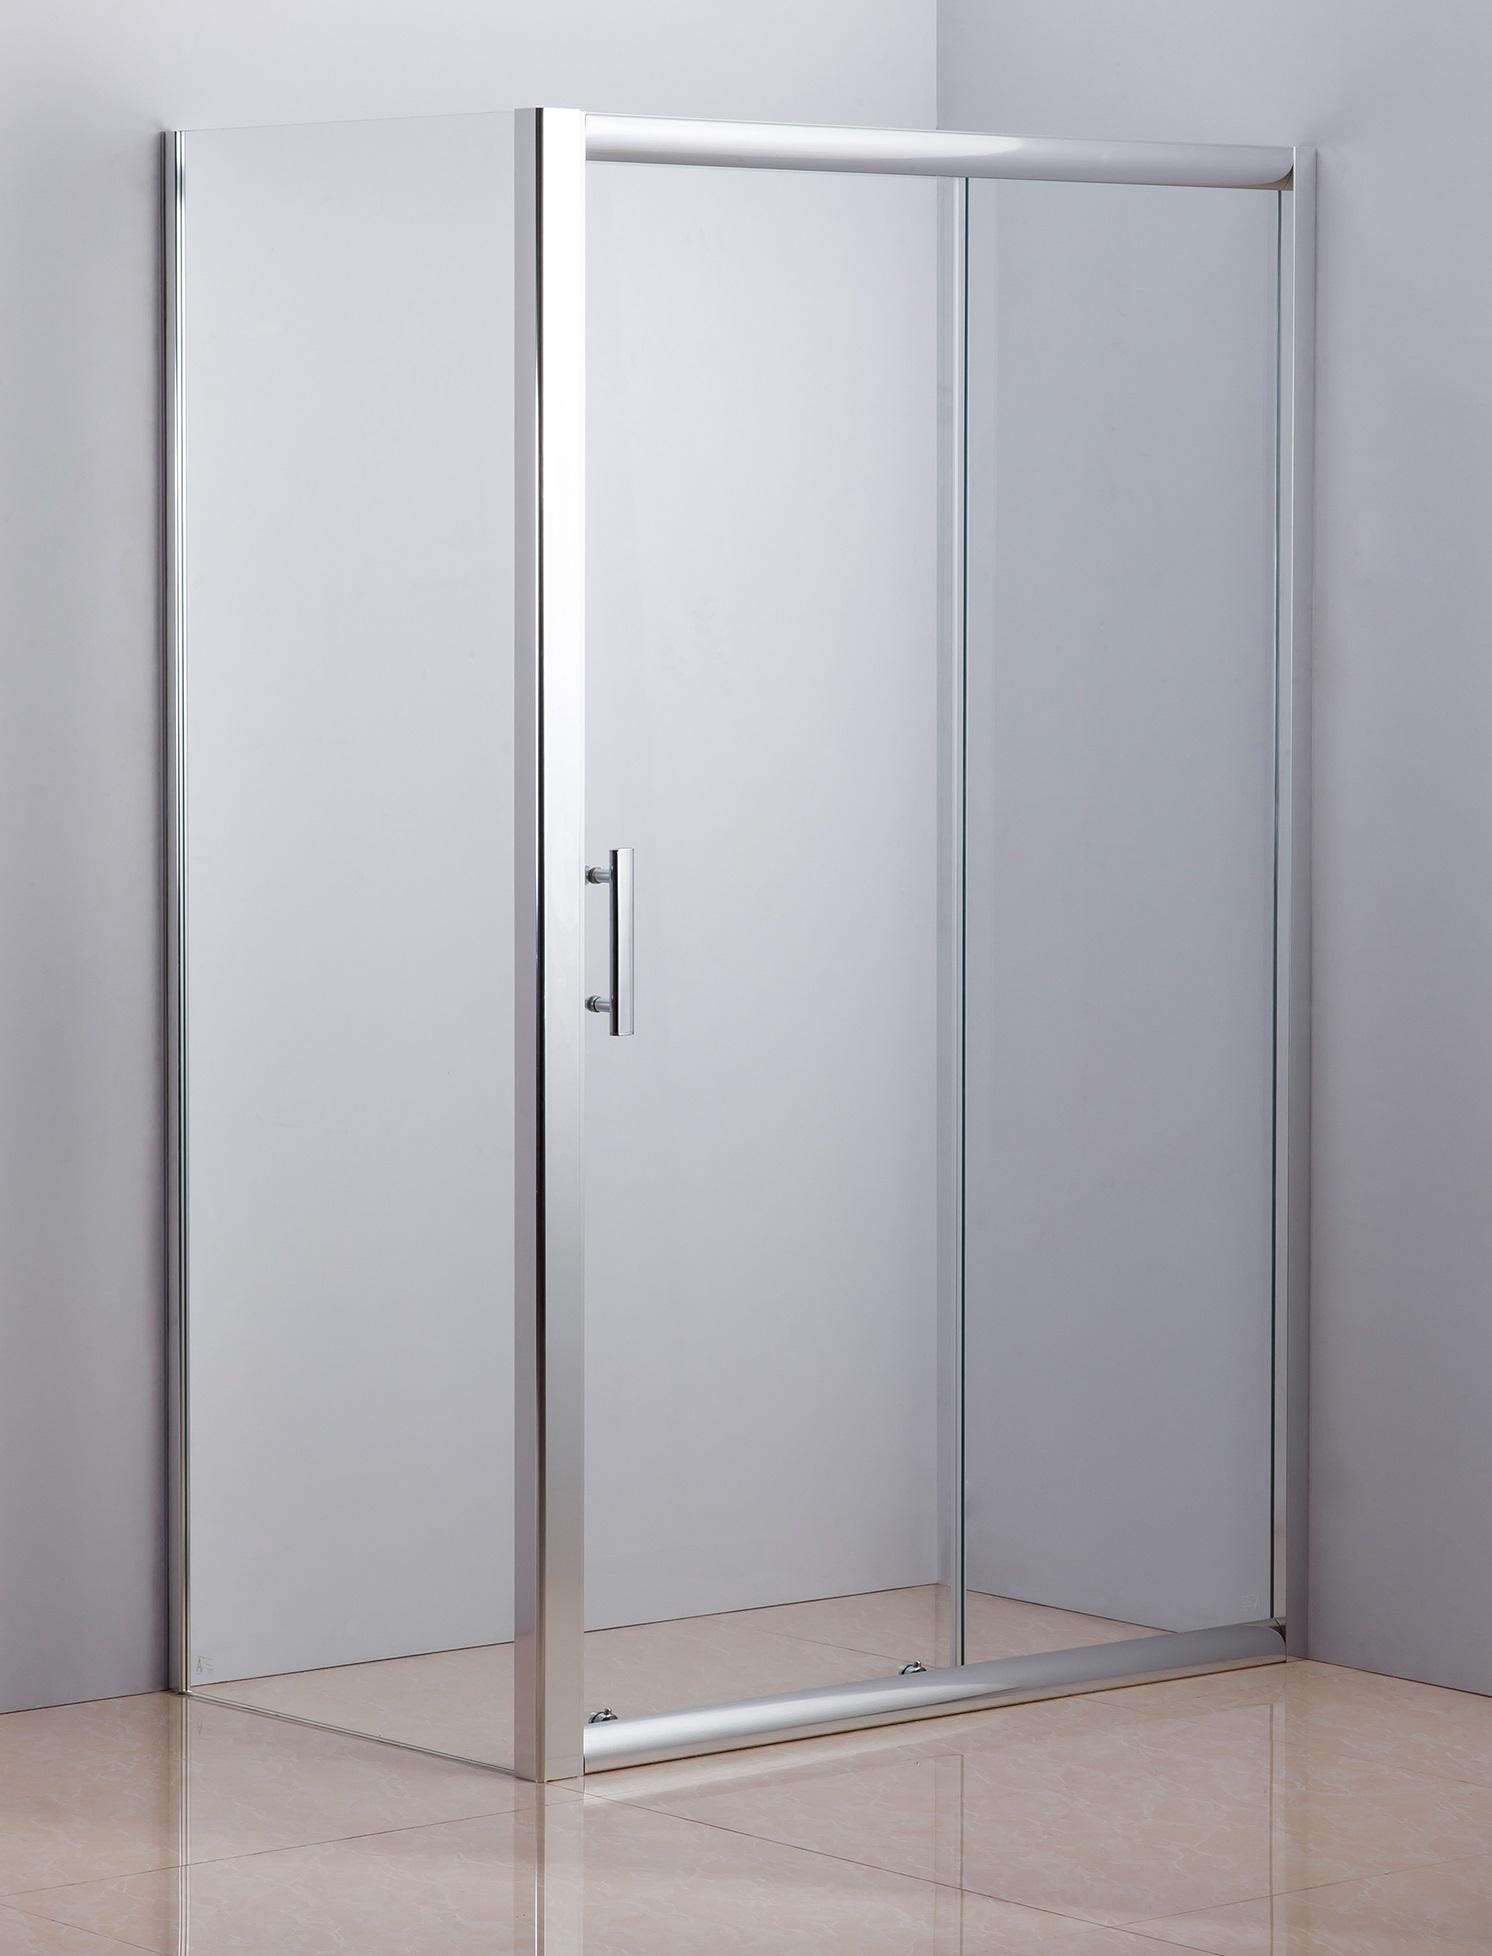 1200 X 700 Sliding Door Safety Glass Shower Screen By Della Francesca  Z2585